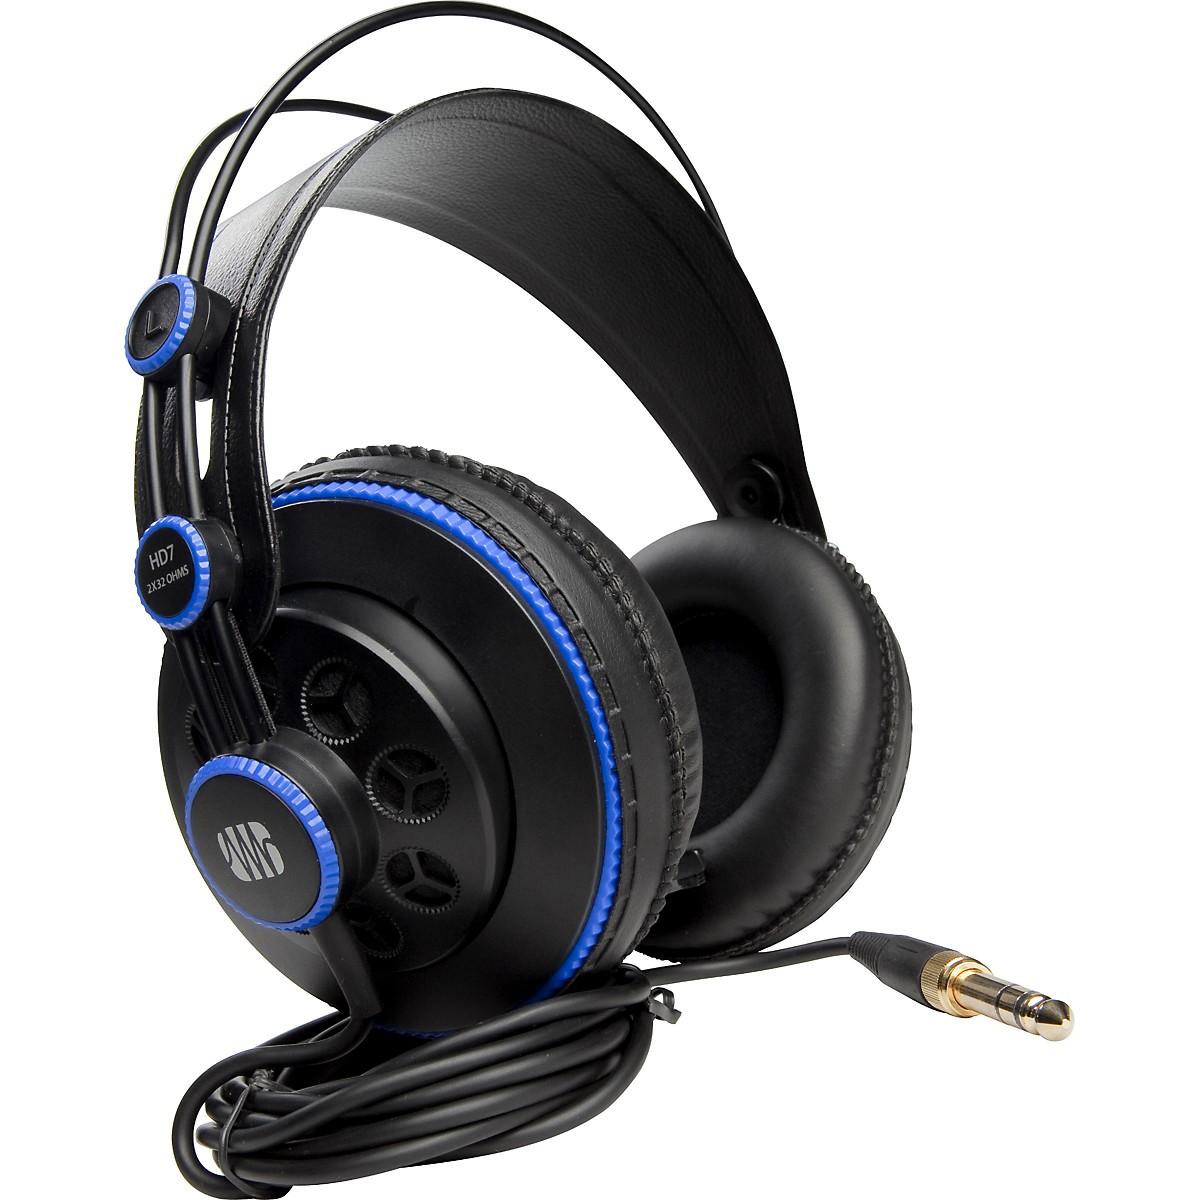 Presonus HD7 Semi-Closed Back Studio Headphones